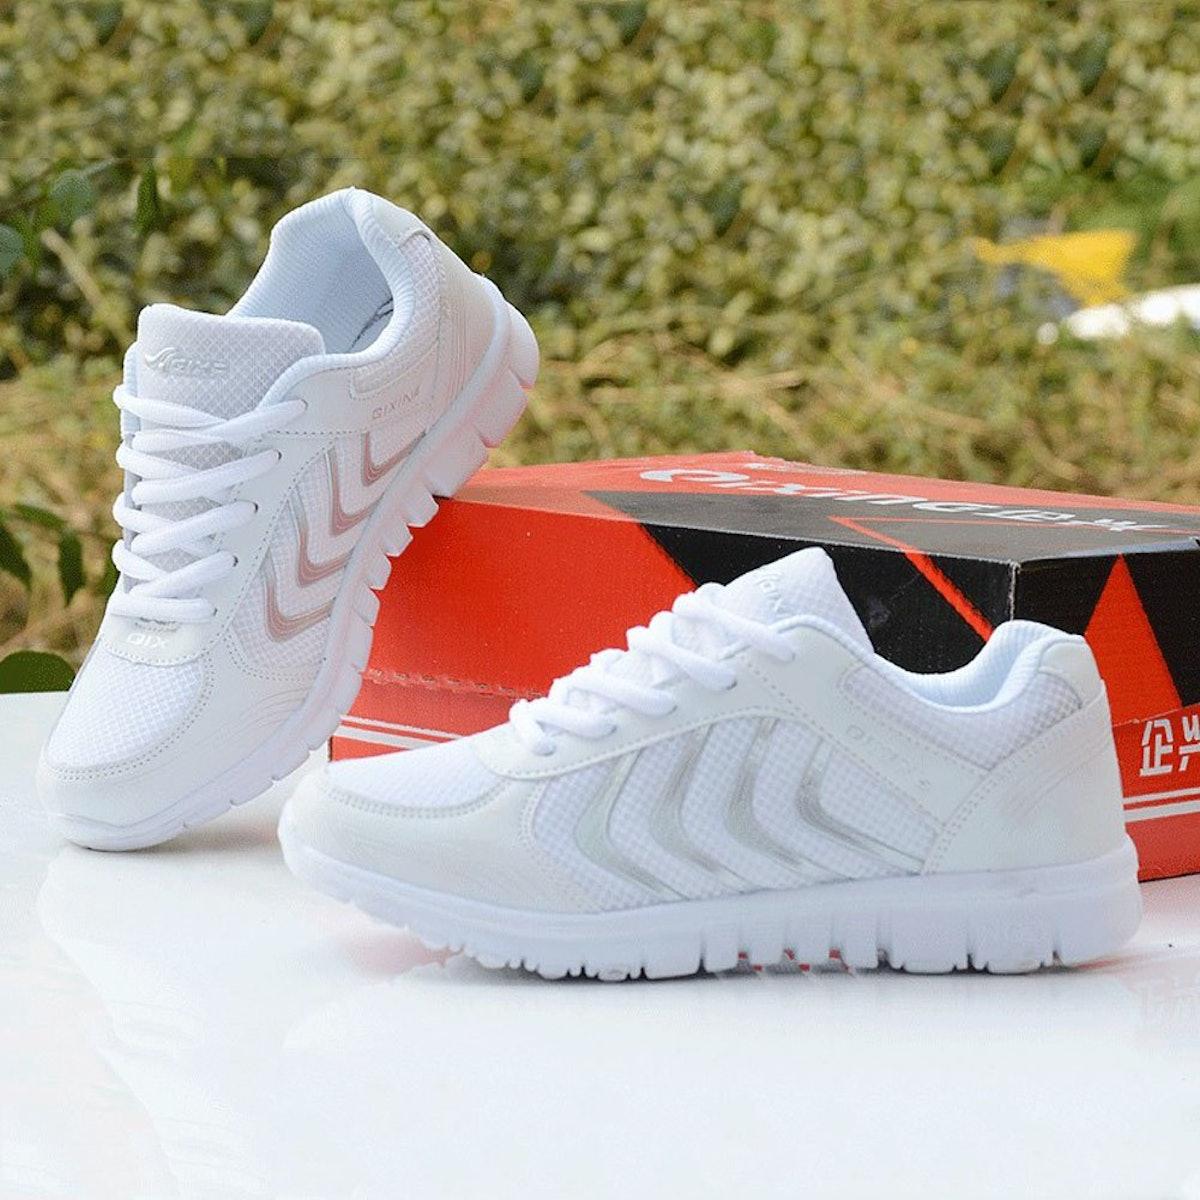 DUOYANGJIASHA Women's Athletic Mesh White Sneakers